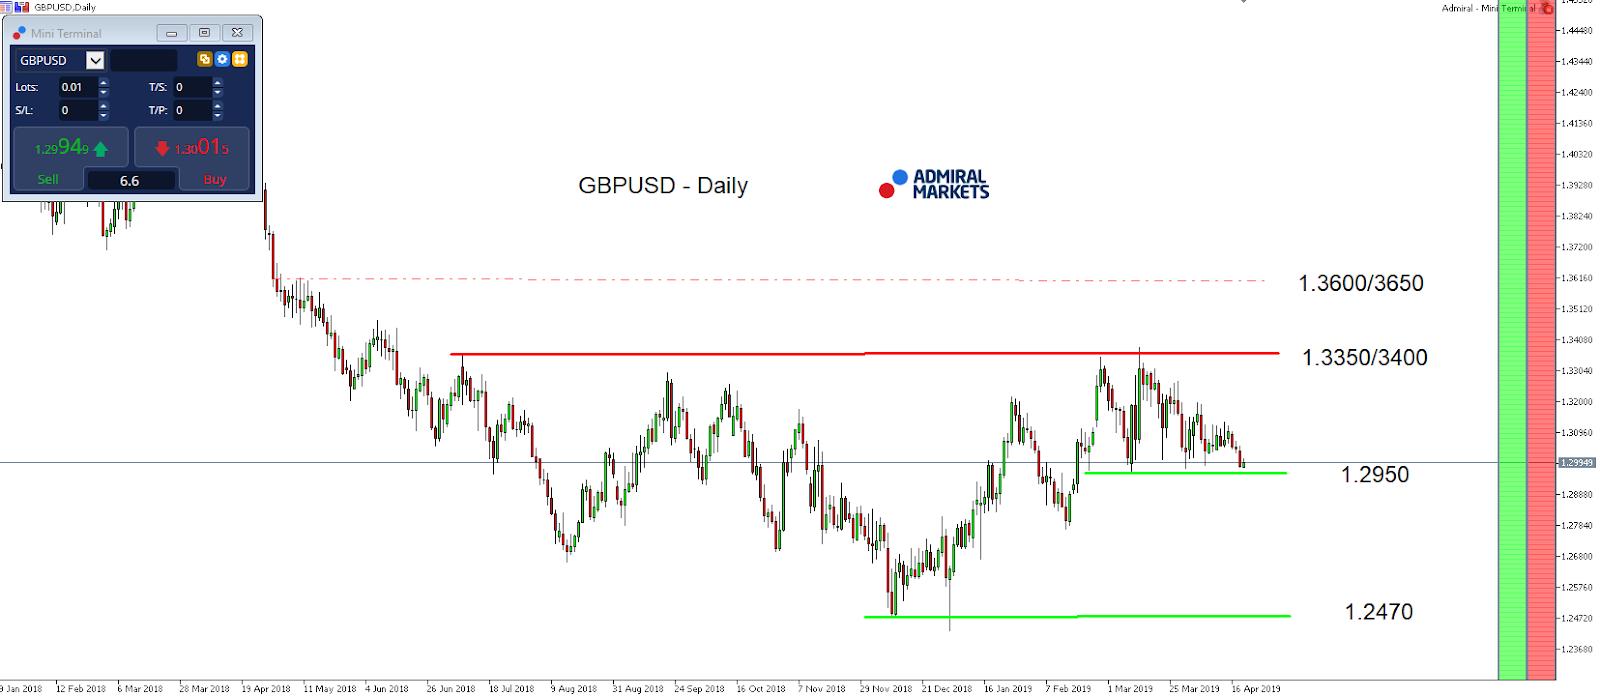 GPB/USD index daily chart